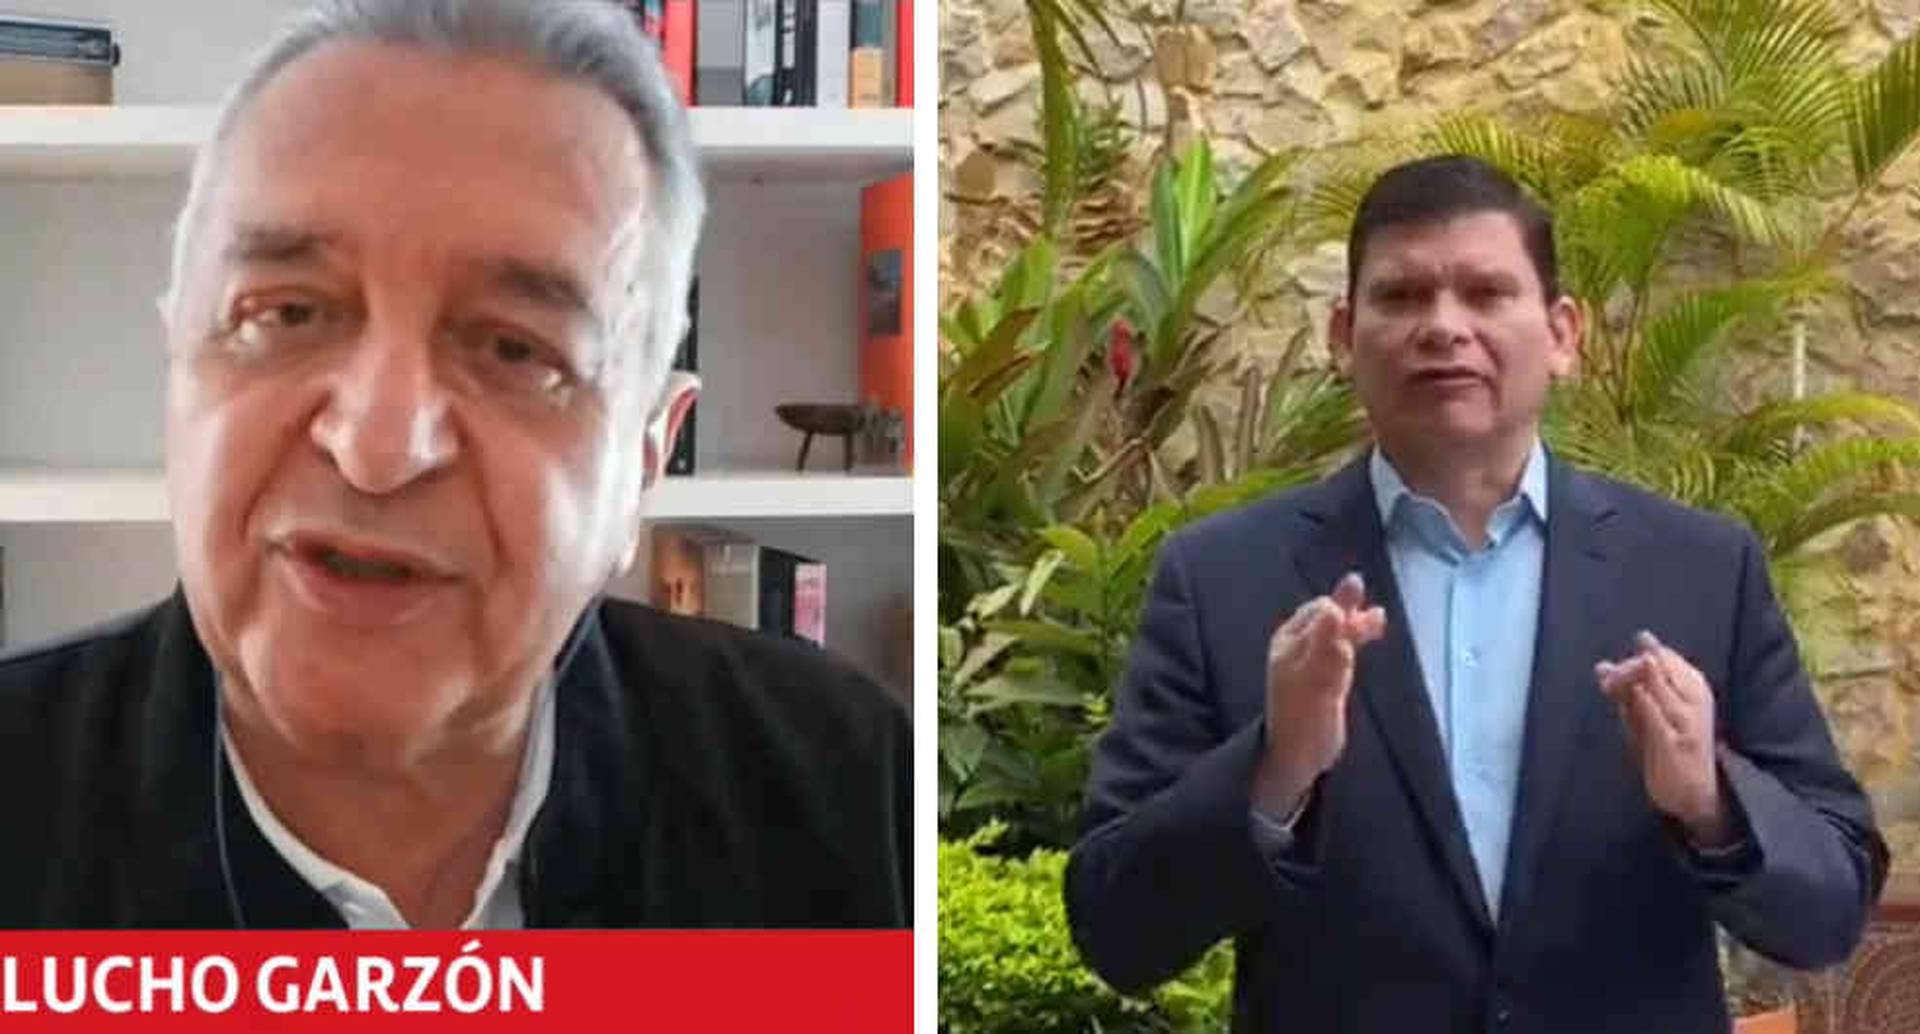 No es provida sino pro oscurantismo: Garzón sobre proyecto del senador Rodríguez